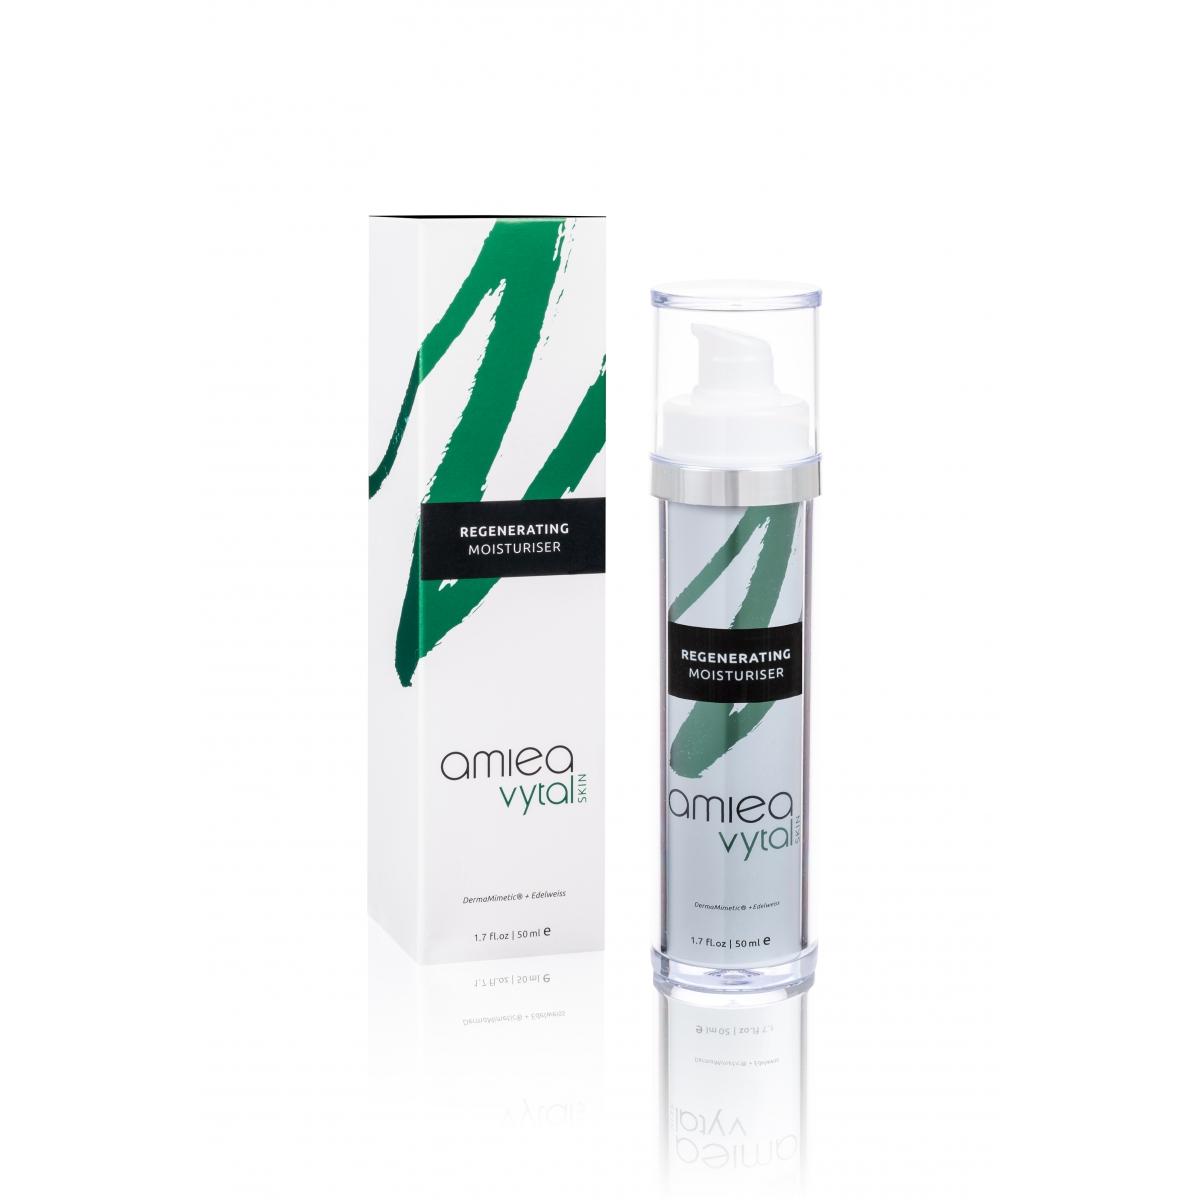 Crèmes - AMIEA VYTAL - CREME HYDRATANTE ANTI-AGE VYTAL SKIN (50 ml)